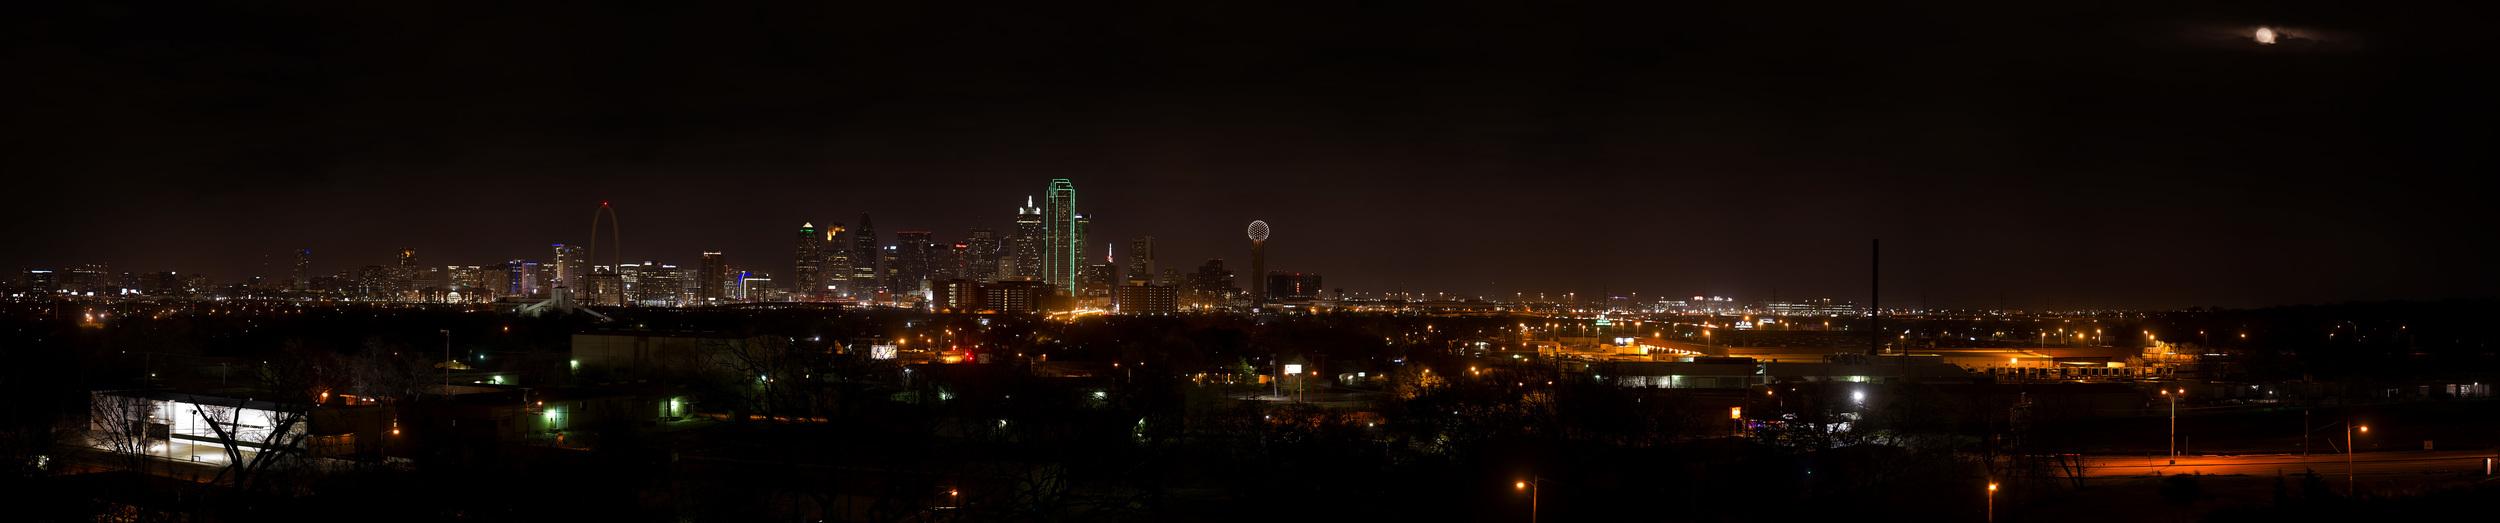 Dallas-Skyline-Belmont-Hotel-Night-Pano-032011.jpg